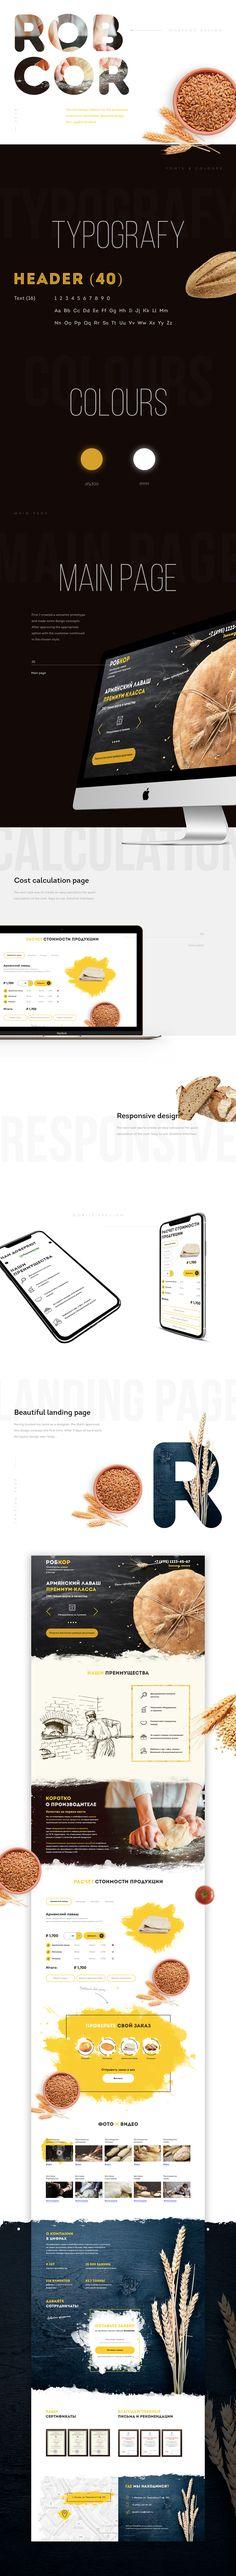 ROBCOR/ LANDING PAGE +FREE MOCKUP IPHONE